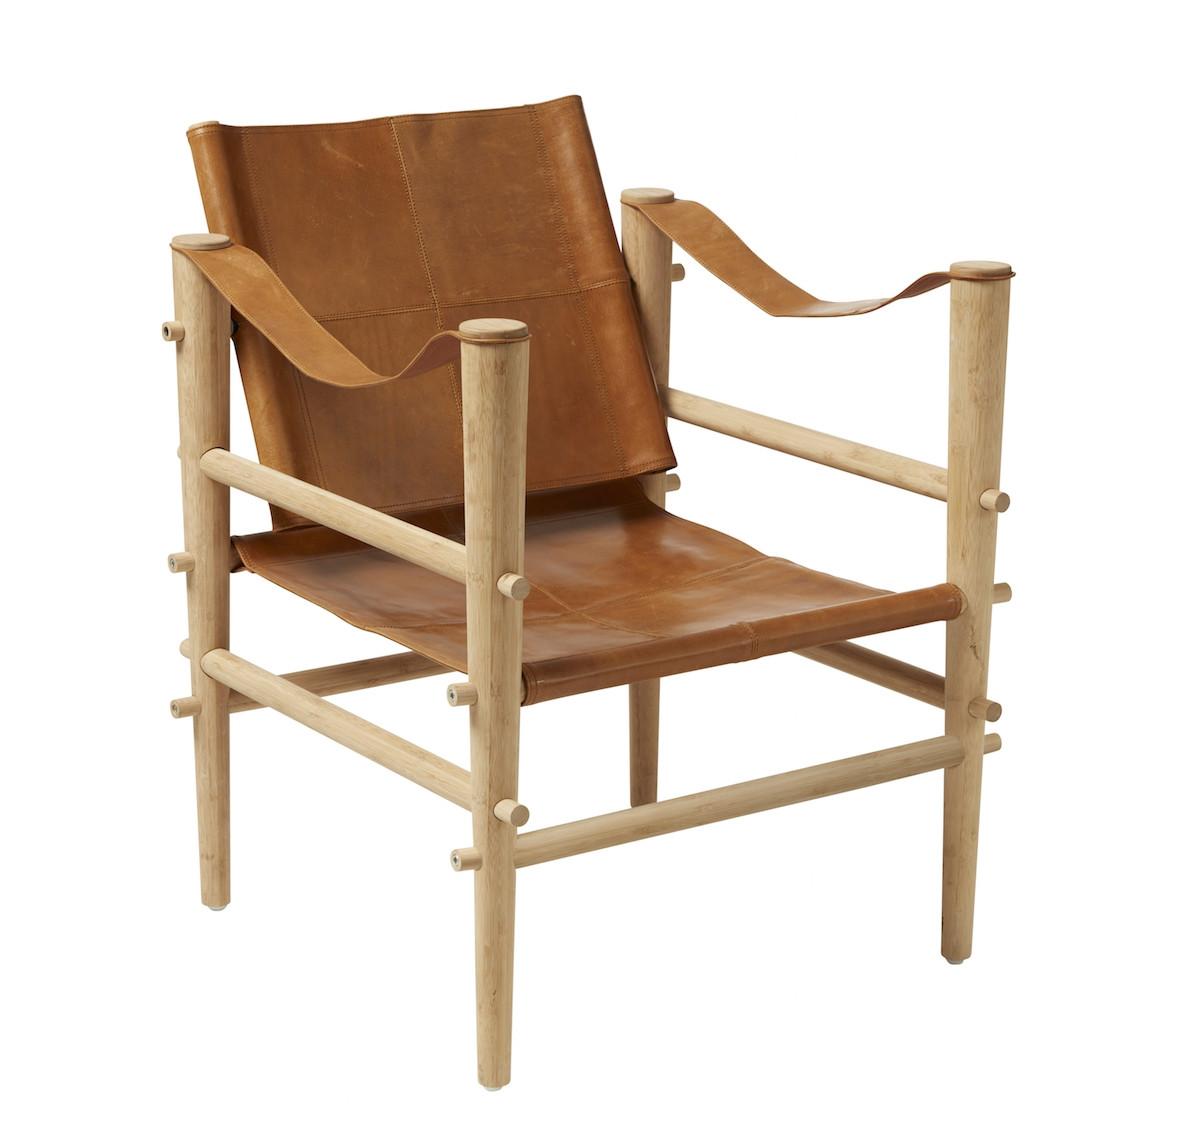 safari stol Møbler fra Cinas safari stol